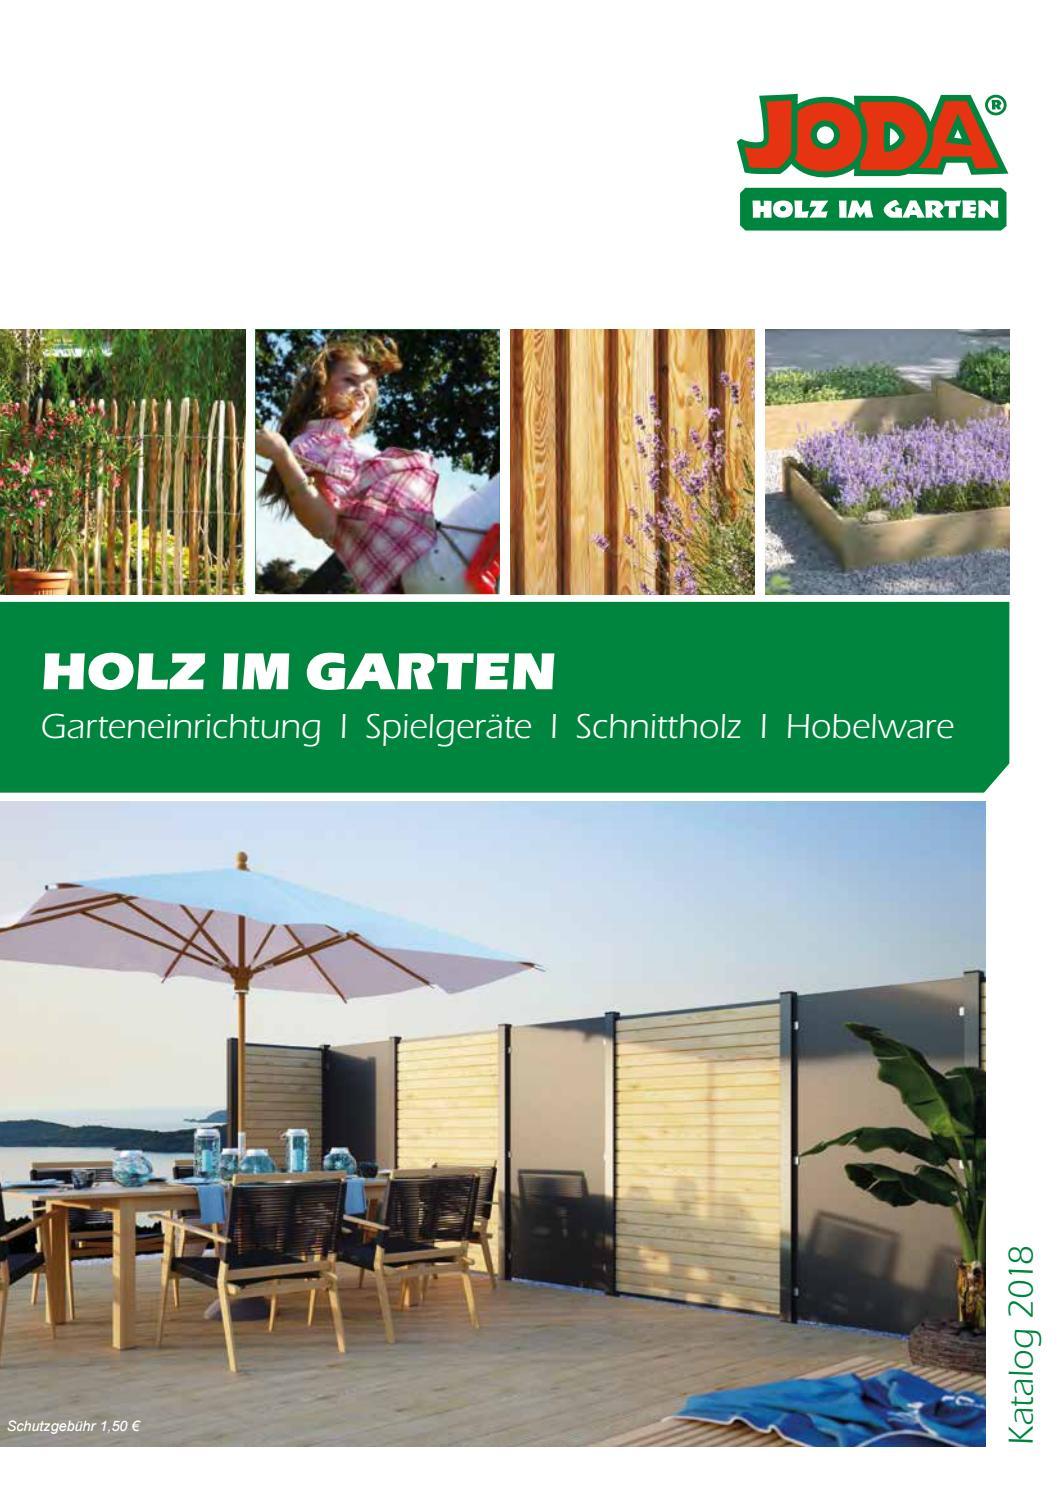 joda holz im garten by kaiser design issuu. Black Bedroom Furniture Sets. Home Design Ideas